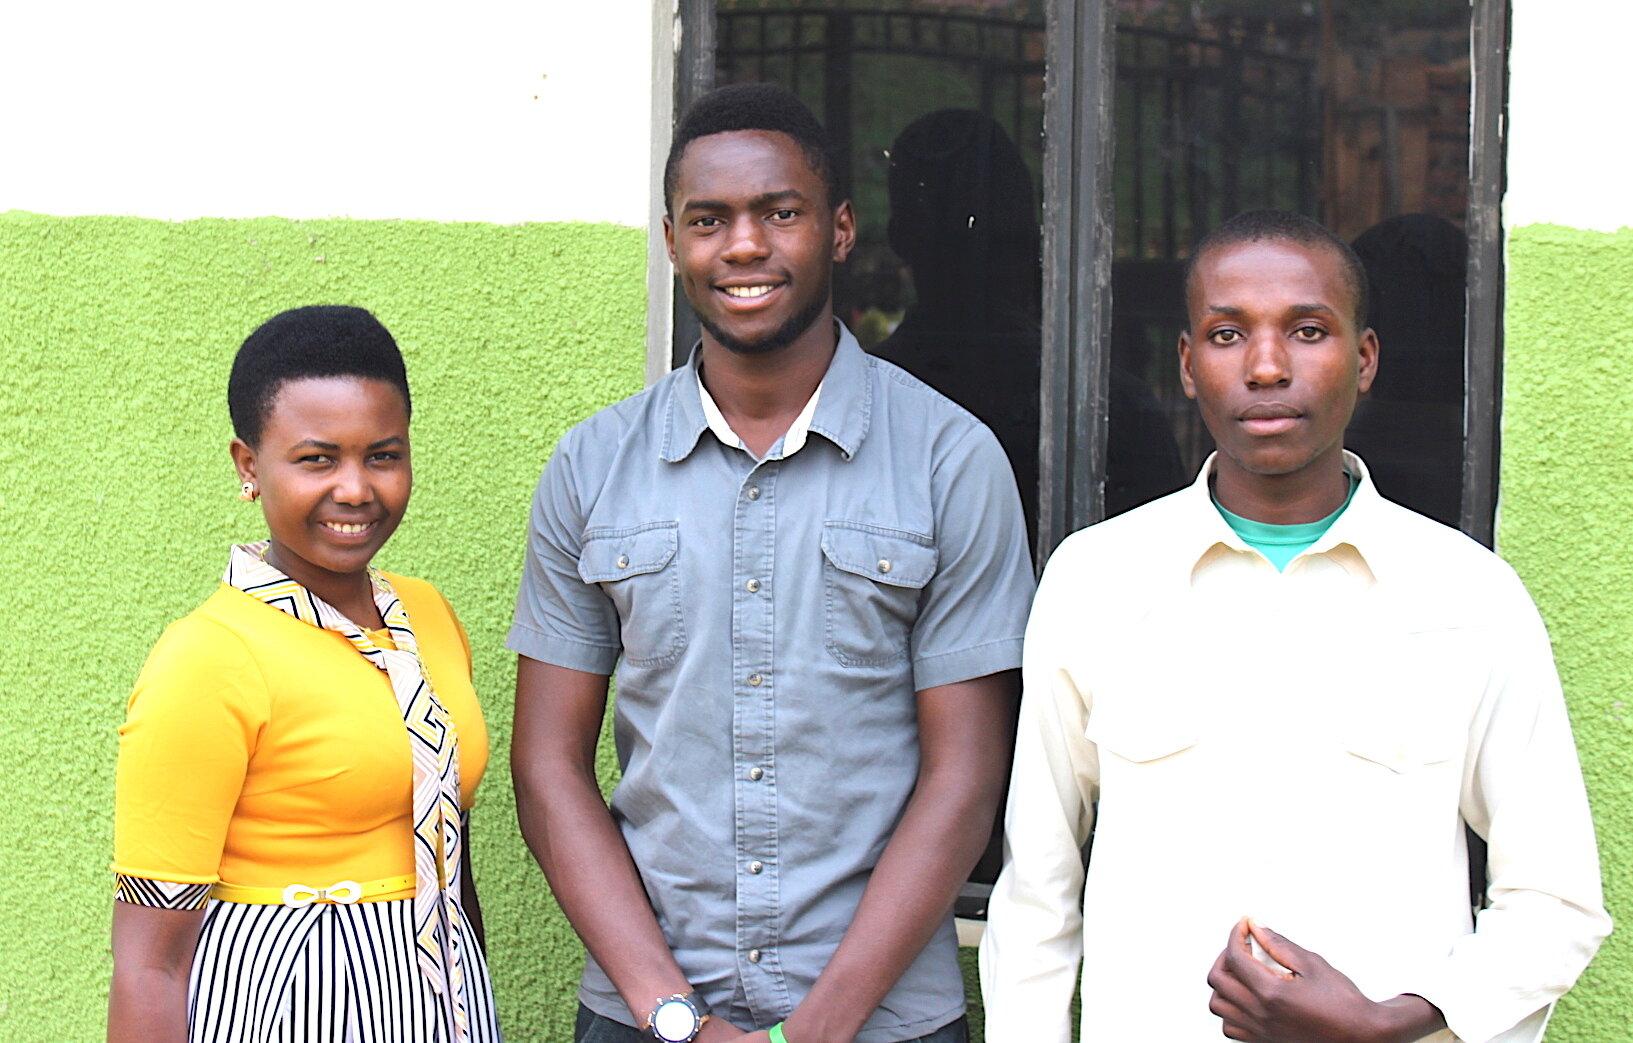 Judith Tukahirwe, Nursing - ACT Staff; Benson Agaba, Kiswahili; Isaac Ainembabazi, Environmental Science